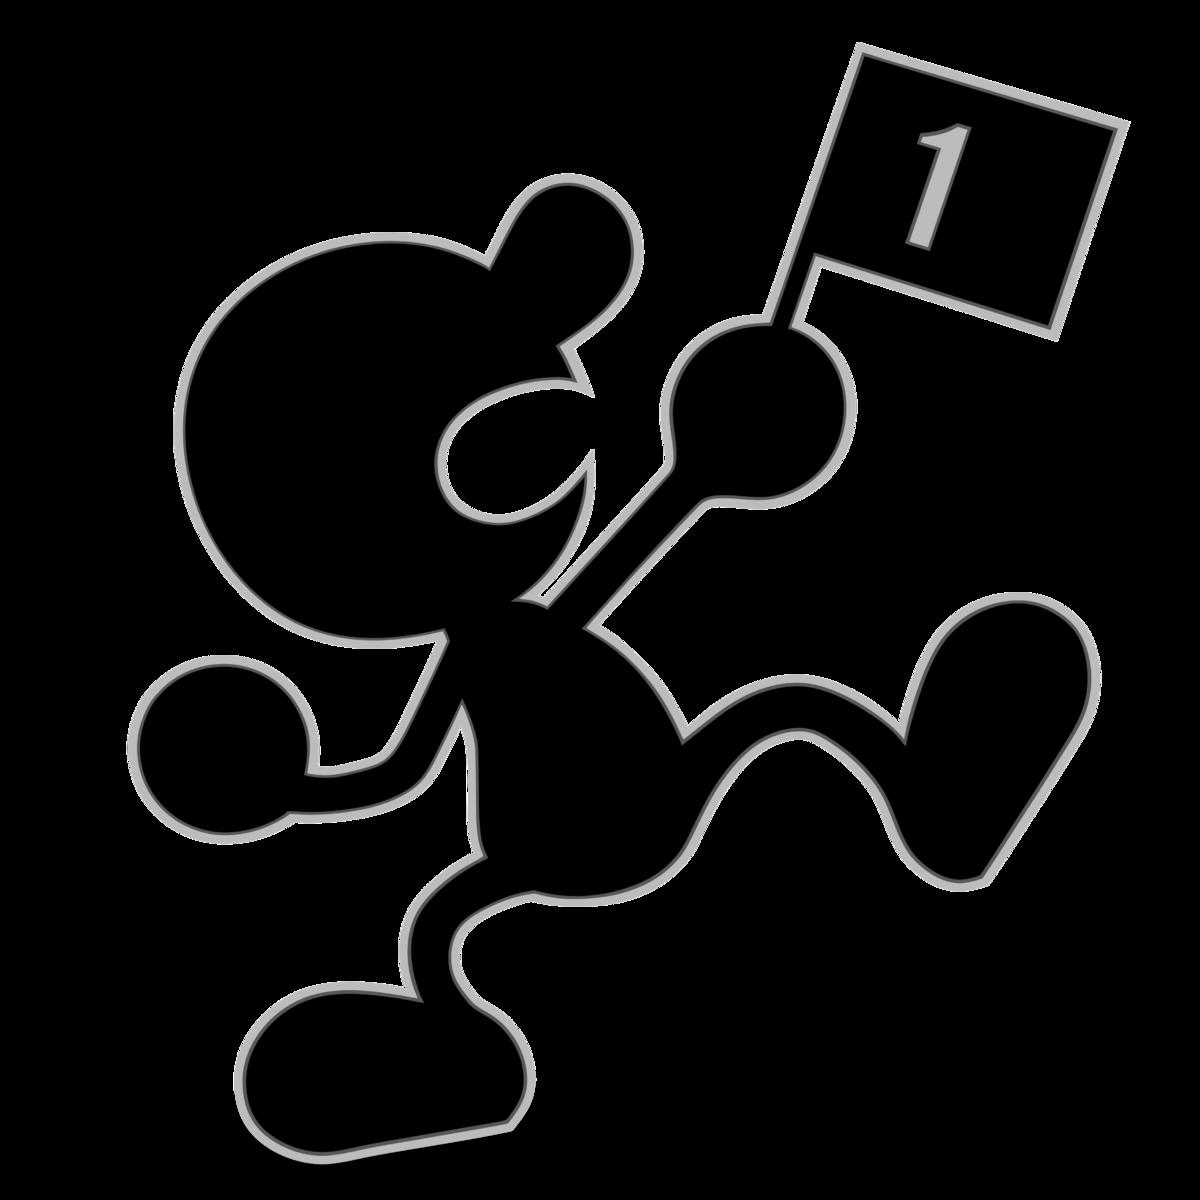 Mr. Game & Watch